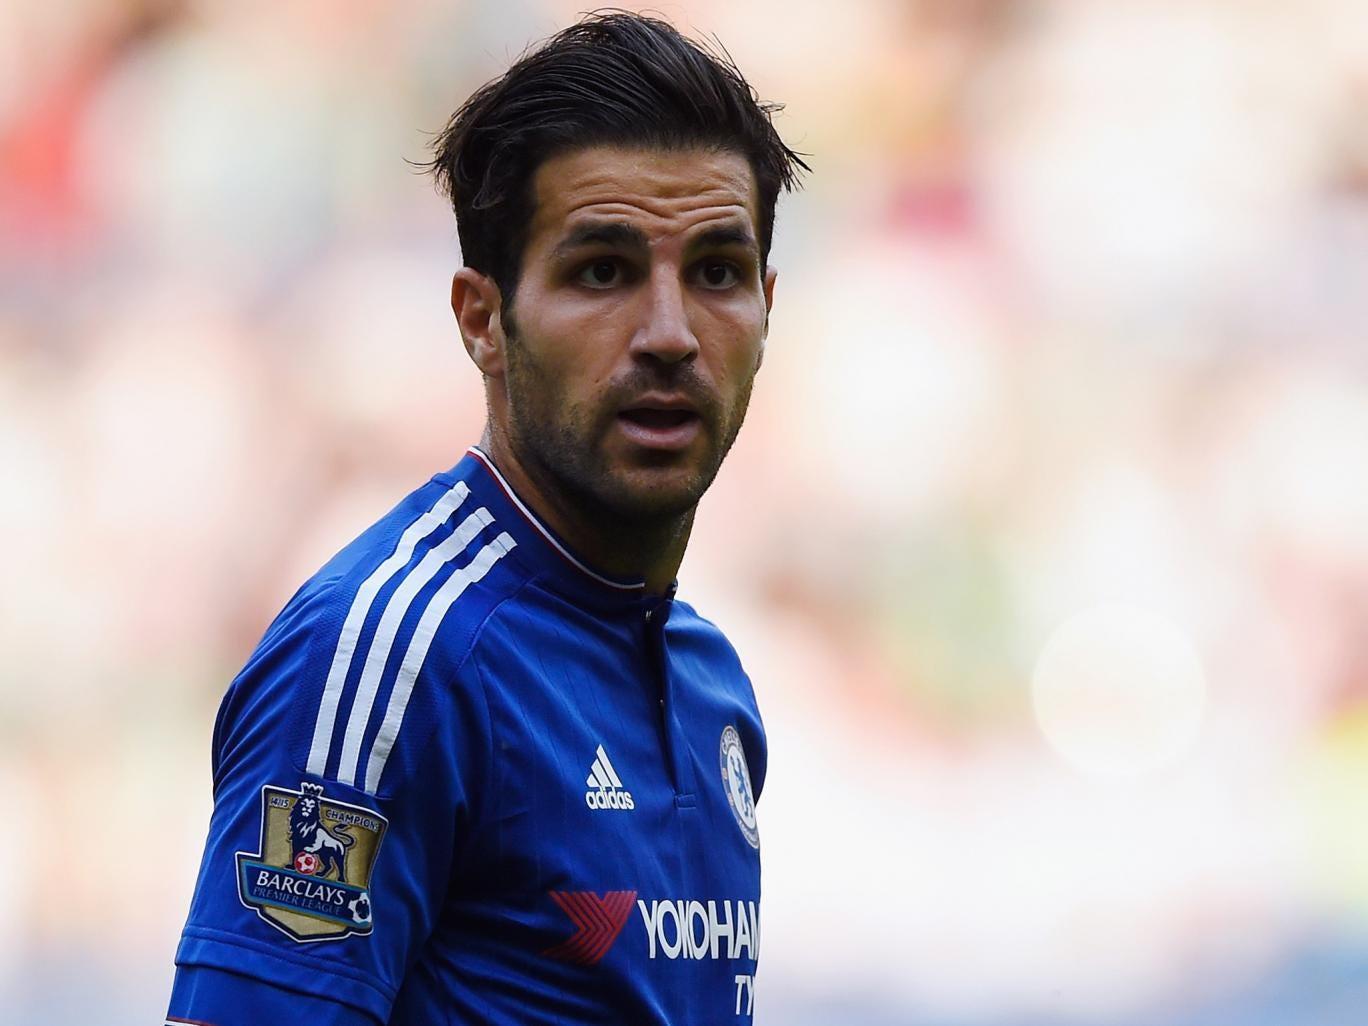 Chelseas Cesc Fabregas Took Two Of The Worst Free kicks